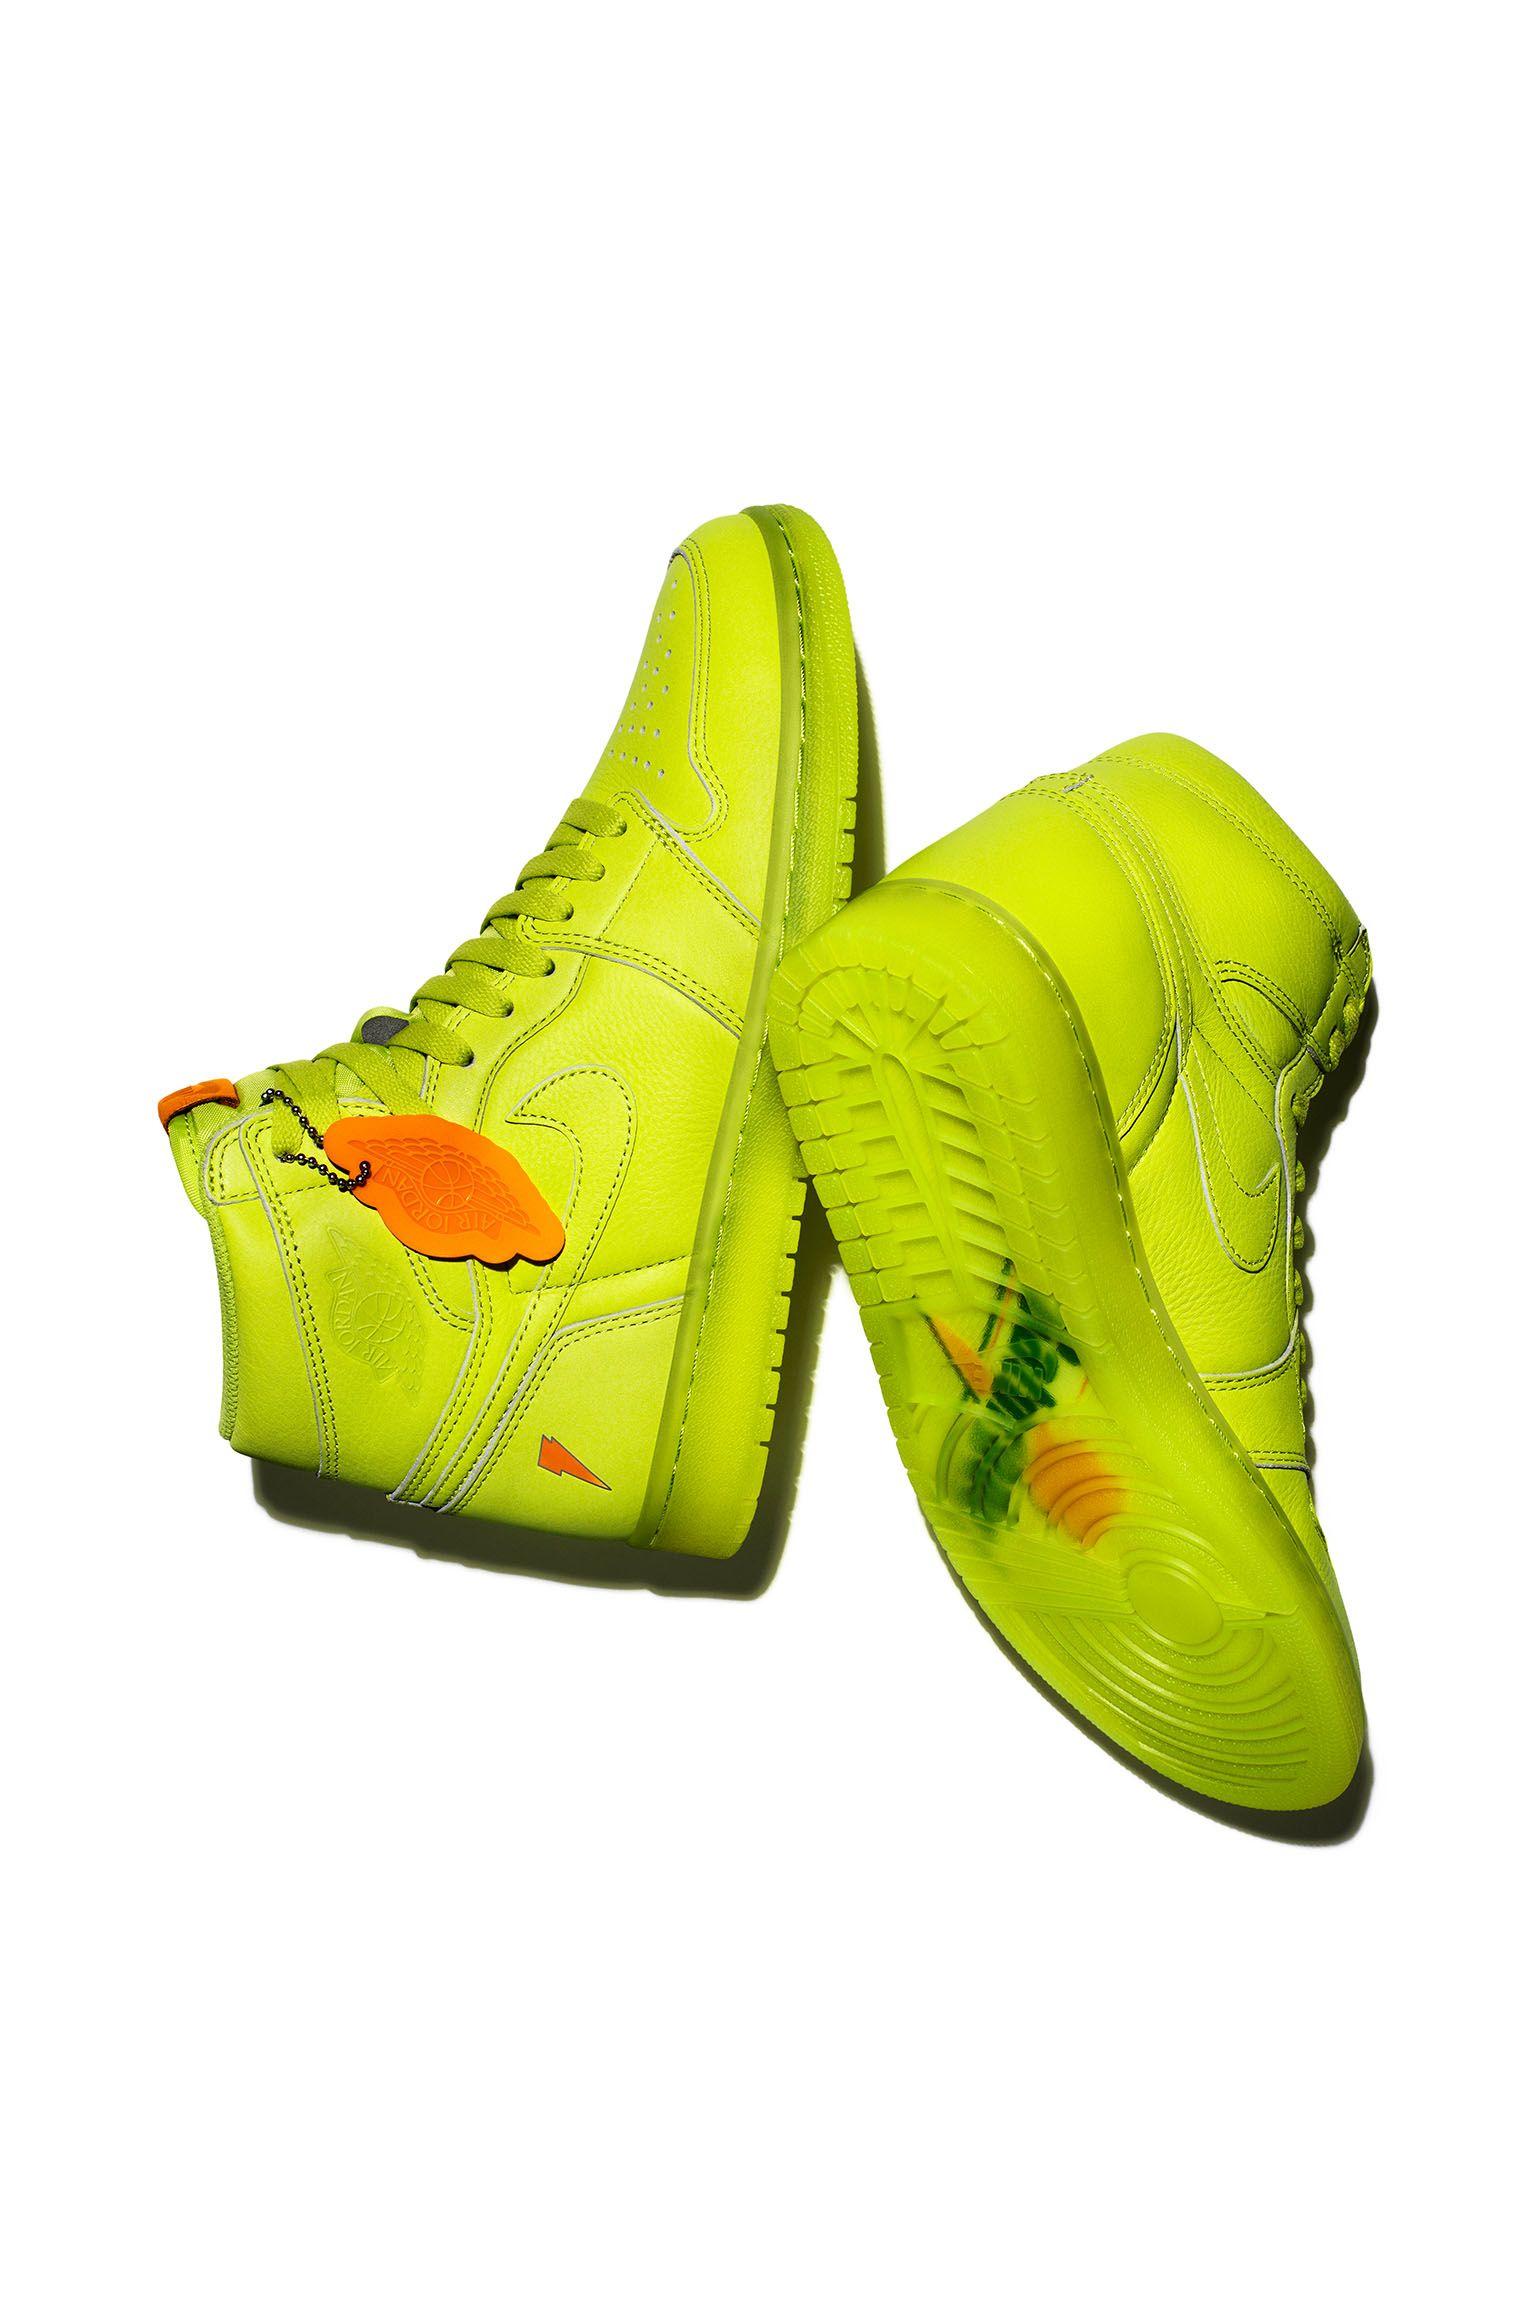 Air Jordan 1 High Gatorade  Lemon-Lime  Release Date. Nike+ SNKRS 632da8013